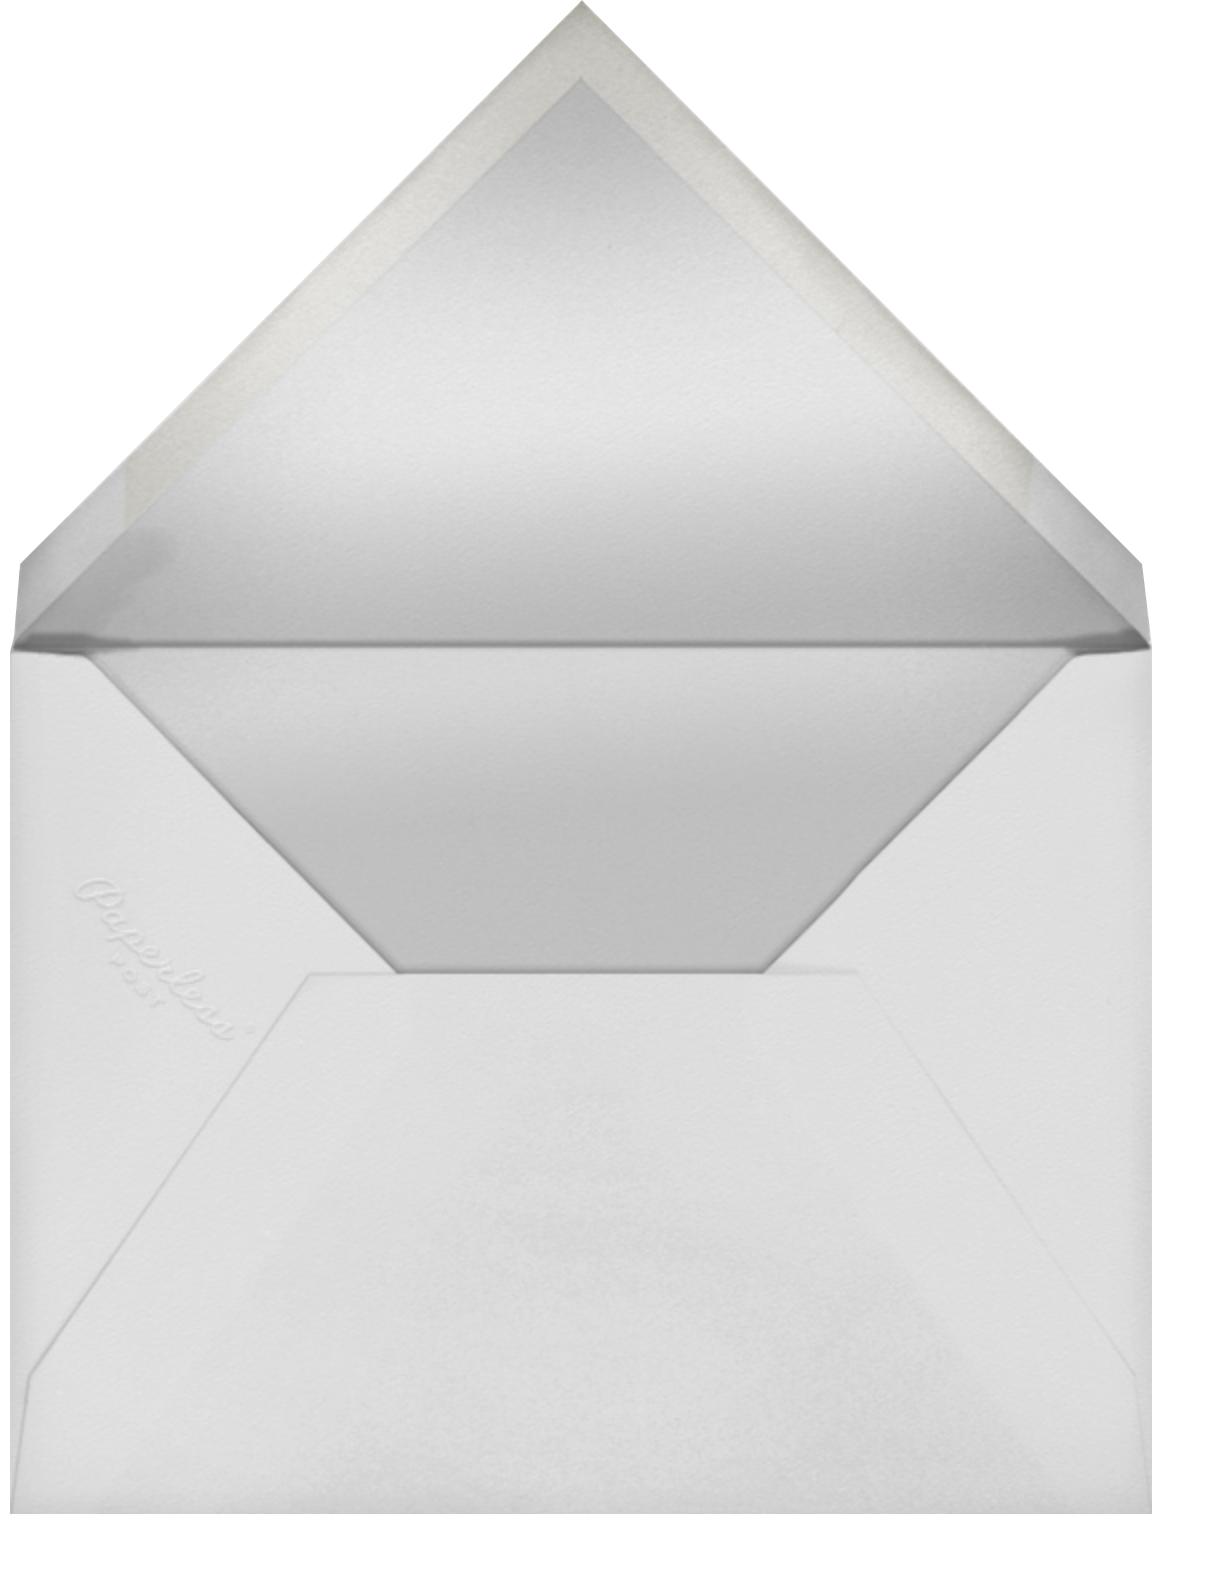 Chalkboard - Happy Anniversary - Paperless Post - Envelope